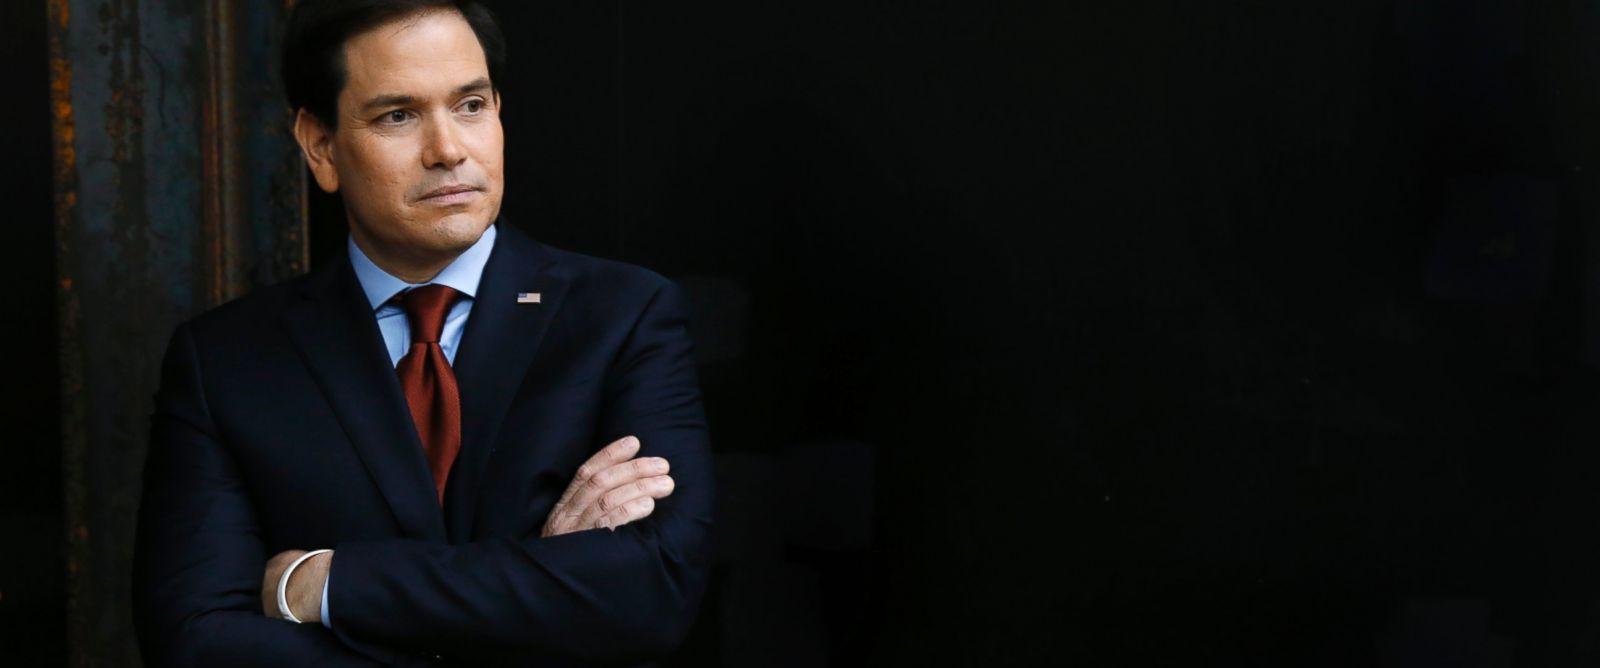 PHOTO:Republican presidential candidate Sen. Marco Rubio waits to speak at a caucus site, Feb. 1, 2016 in Clive, Iowa.